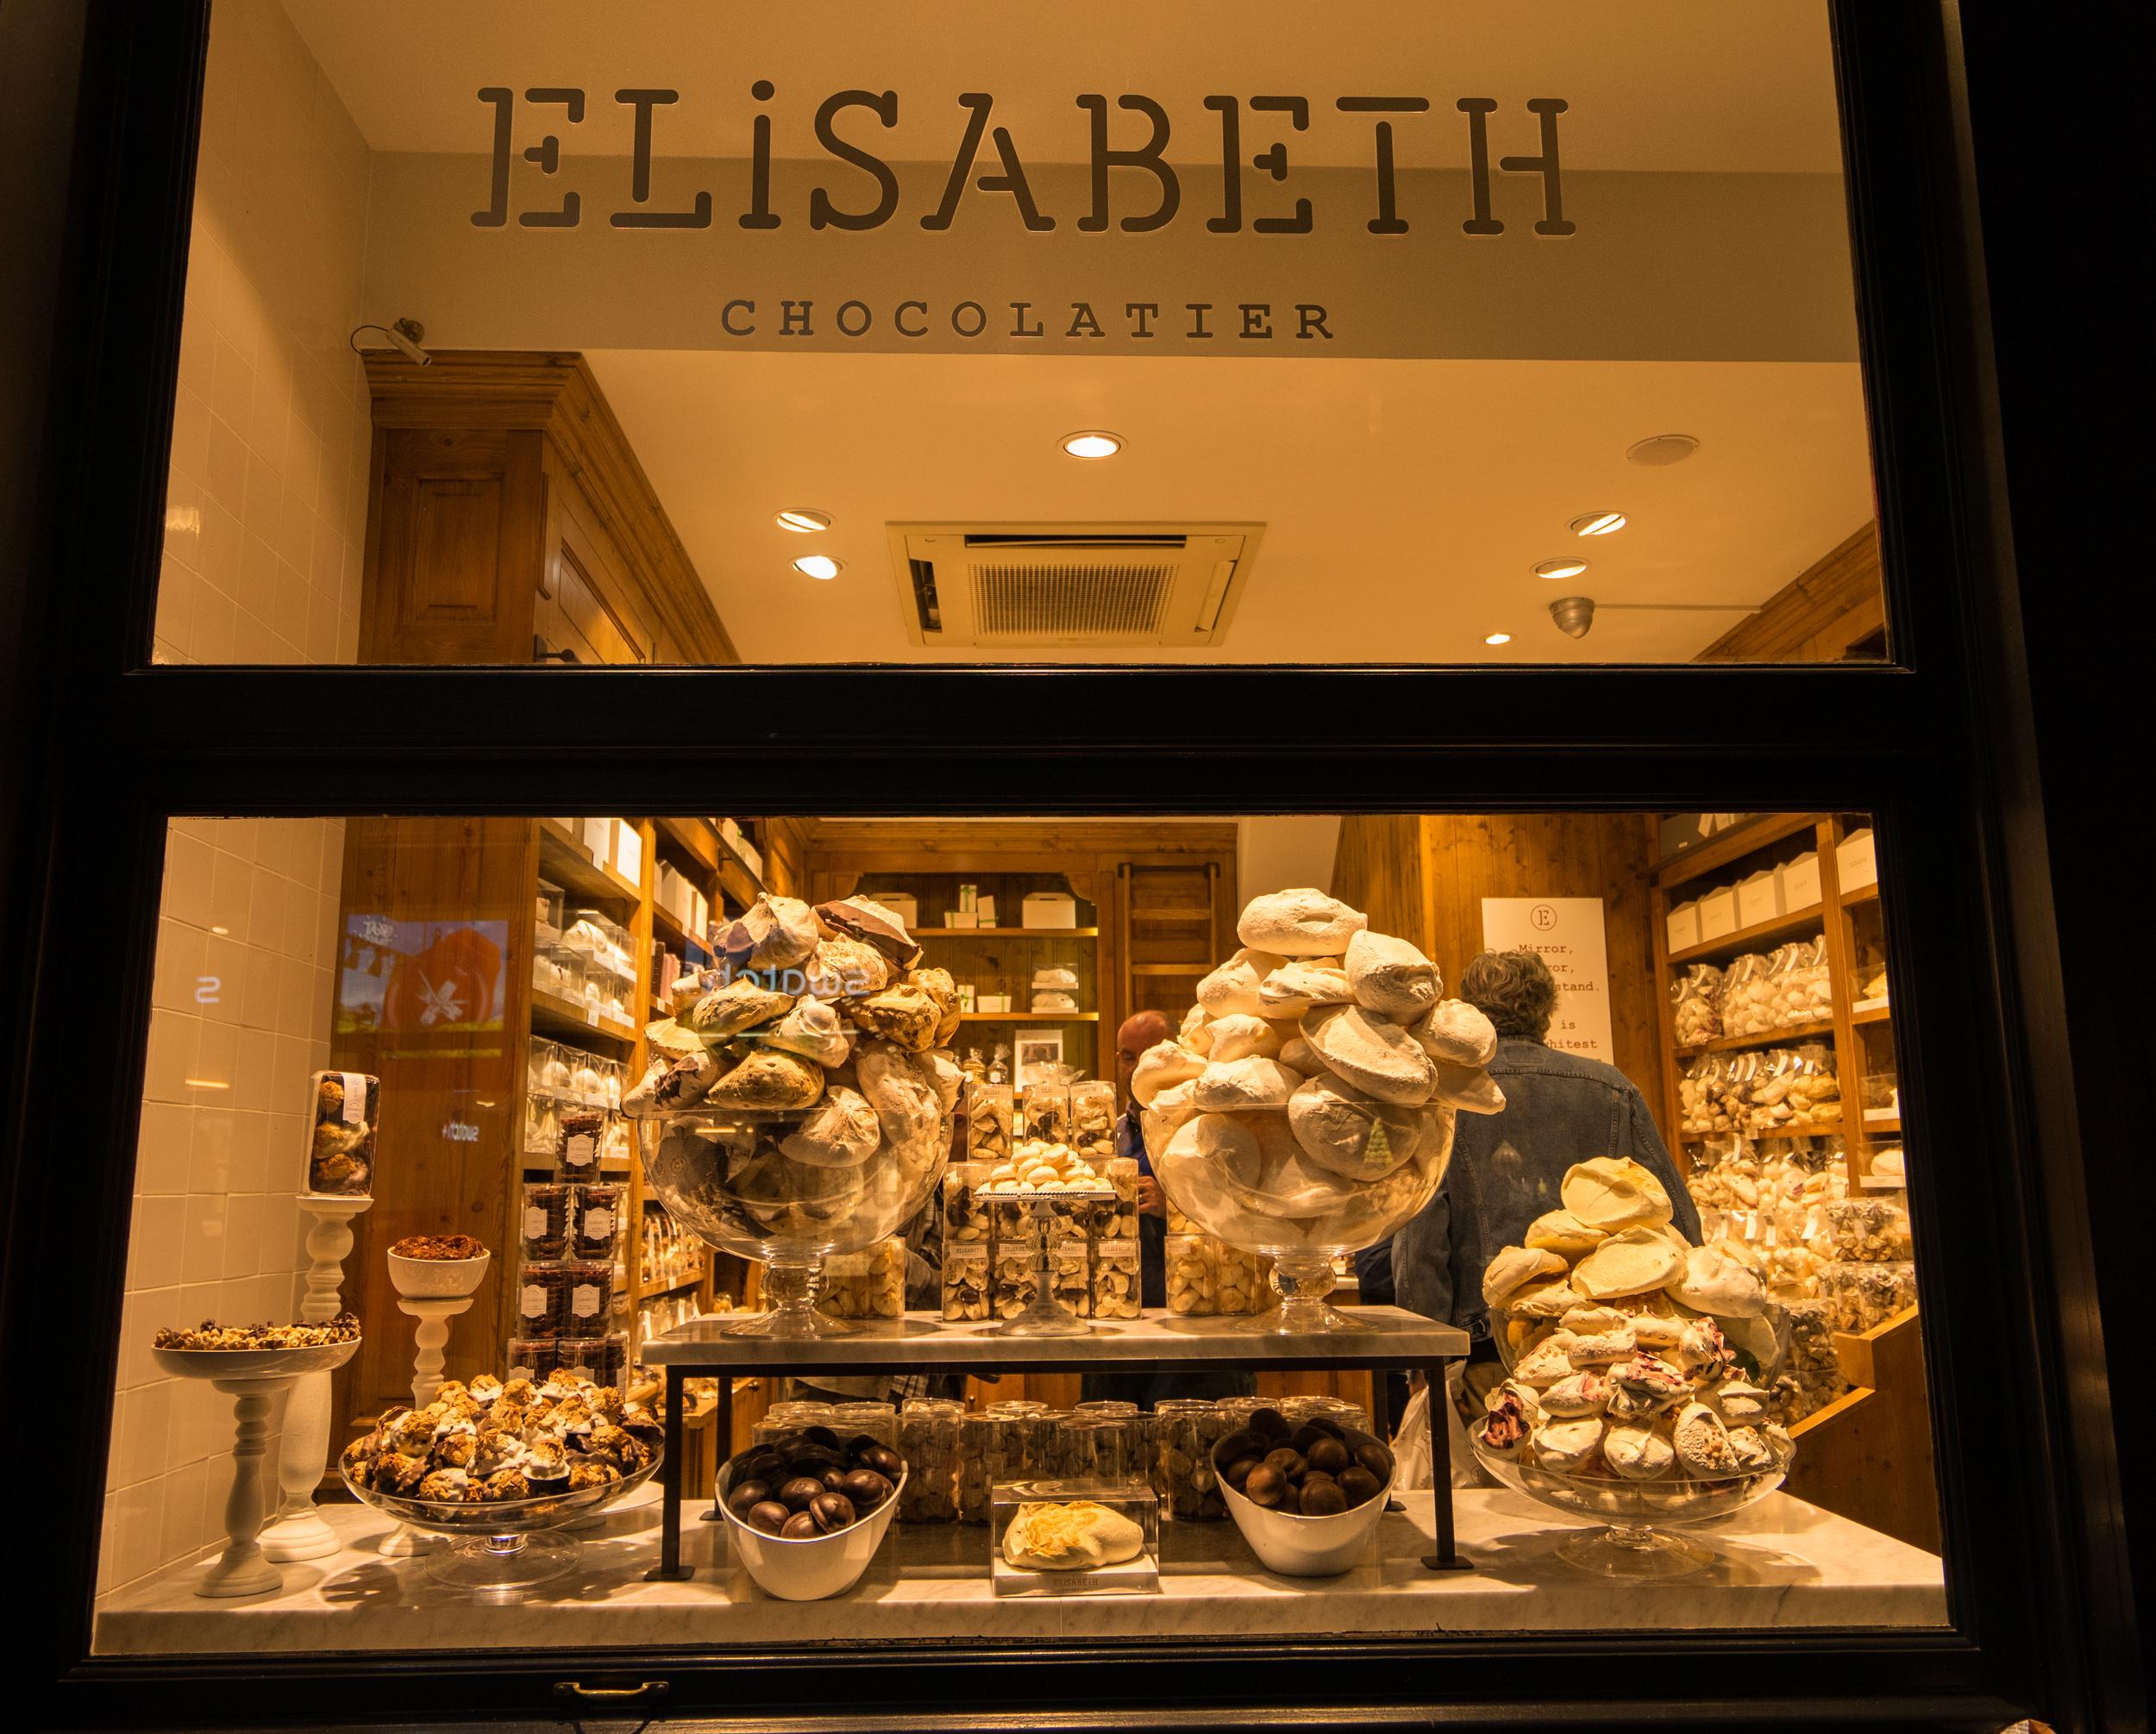 ELISABETH CHOCOLATIER // IMAGE BY MEETYOUTHERE.ME & FRANKIEBOYPHOTOGRAPHY